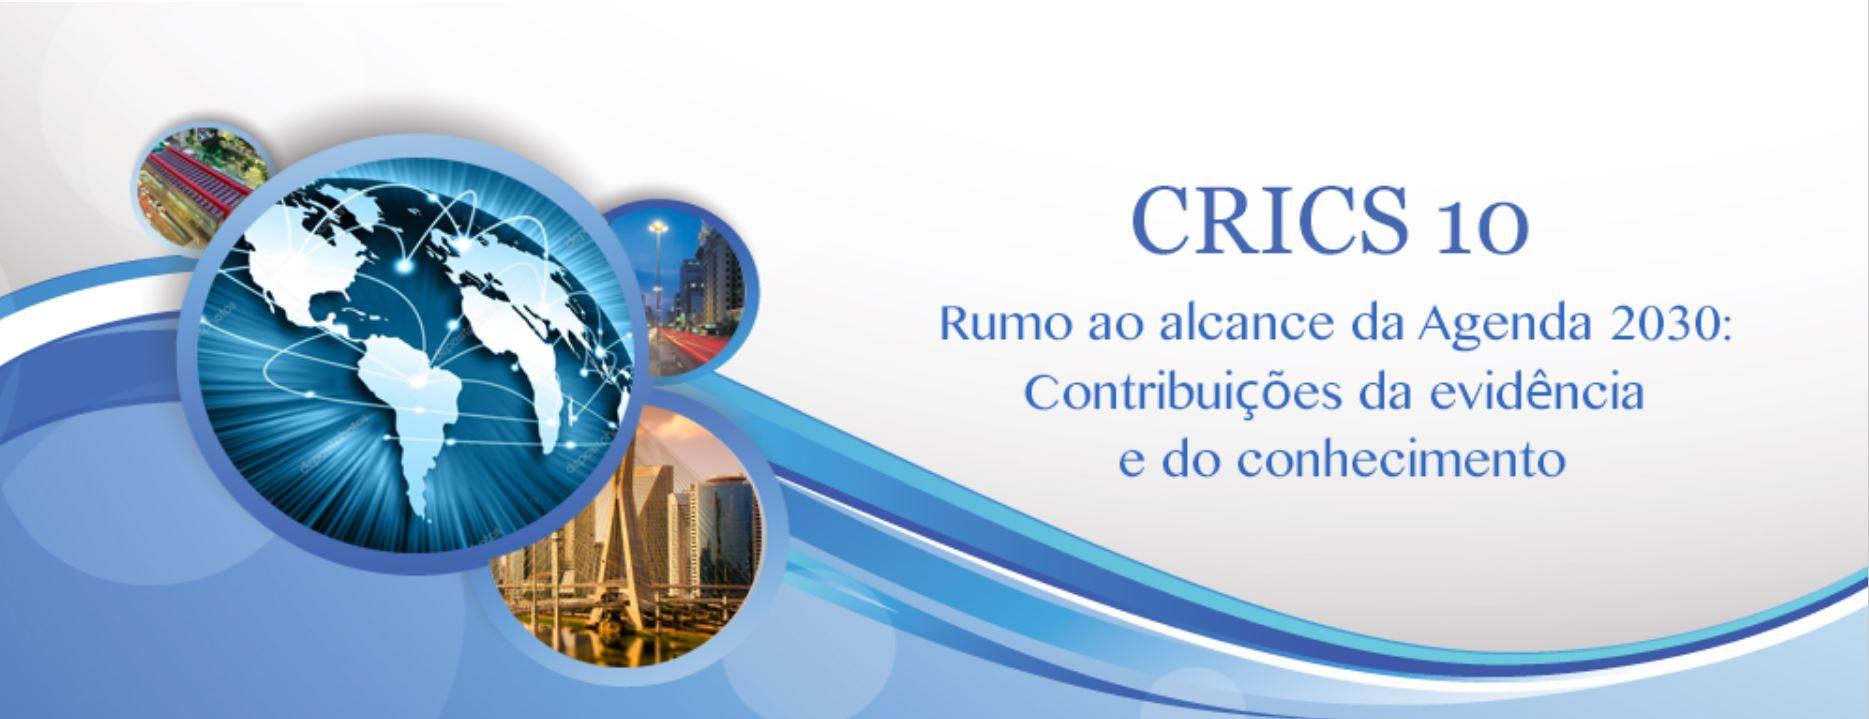 destaque_crics_comite_pt